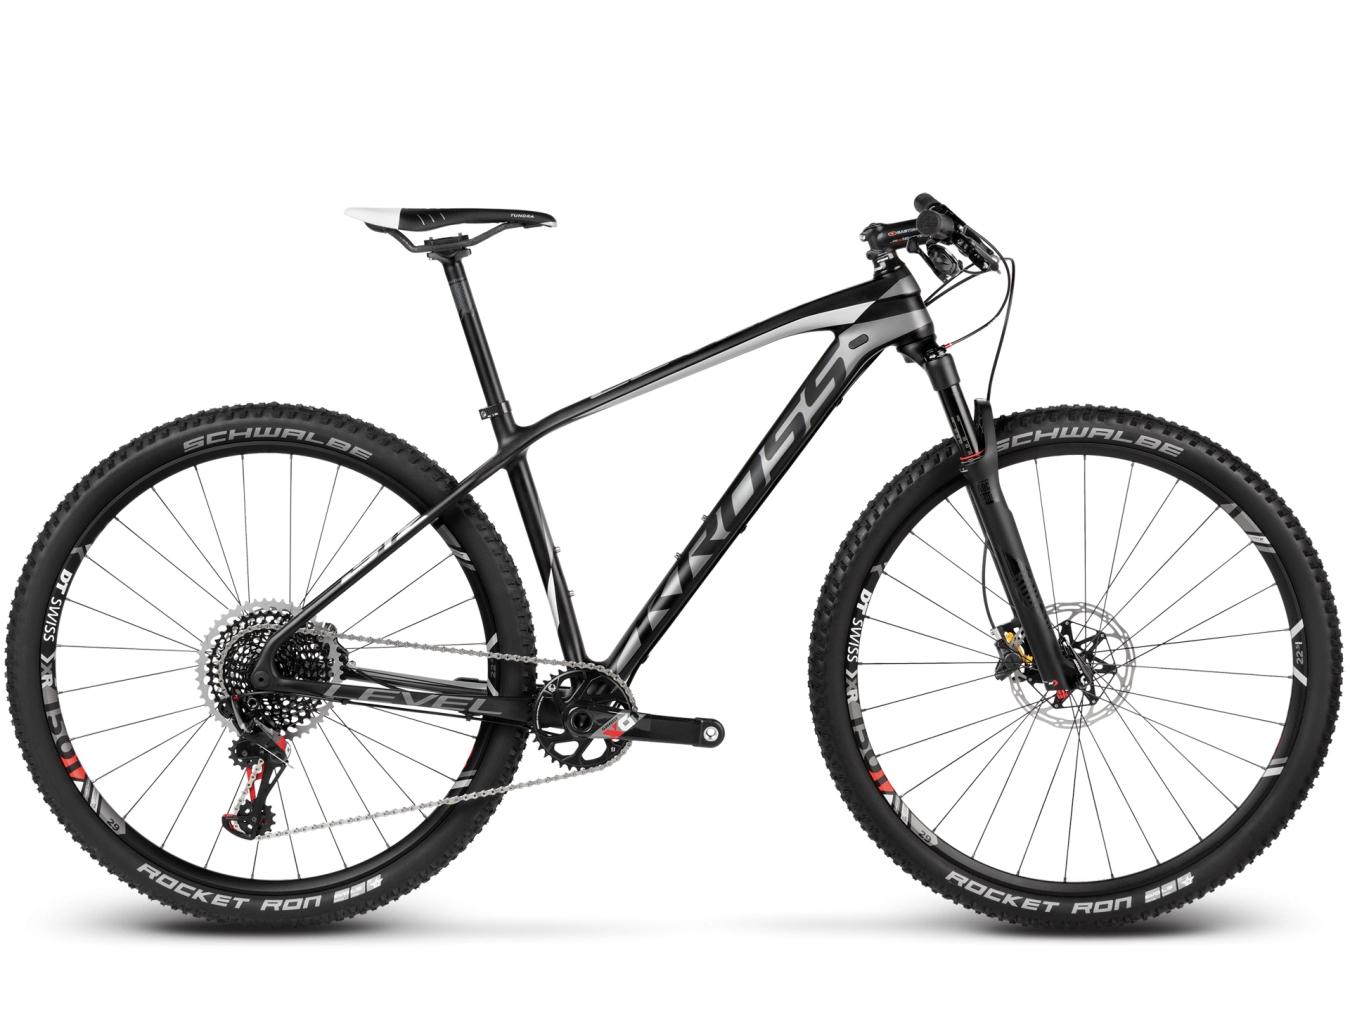 bici level b12 bicicletas mountain mtb xc kross. Black Bedroom Furniture Sets. Home Design Ideas